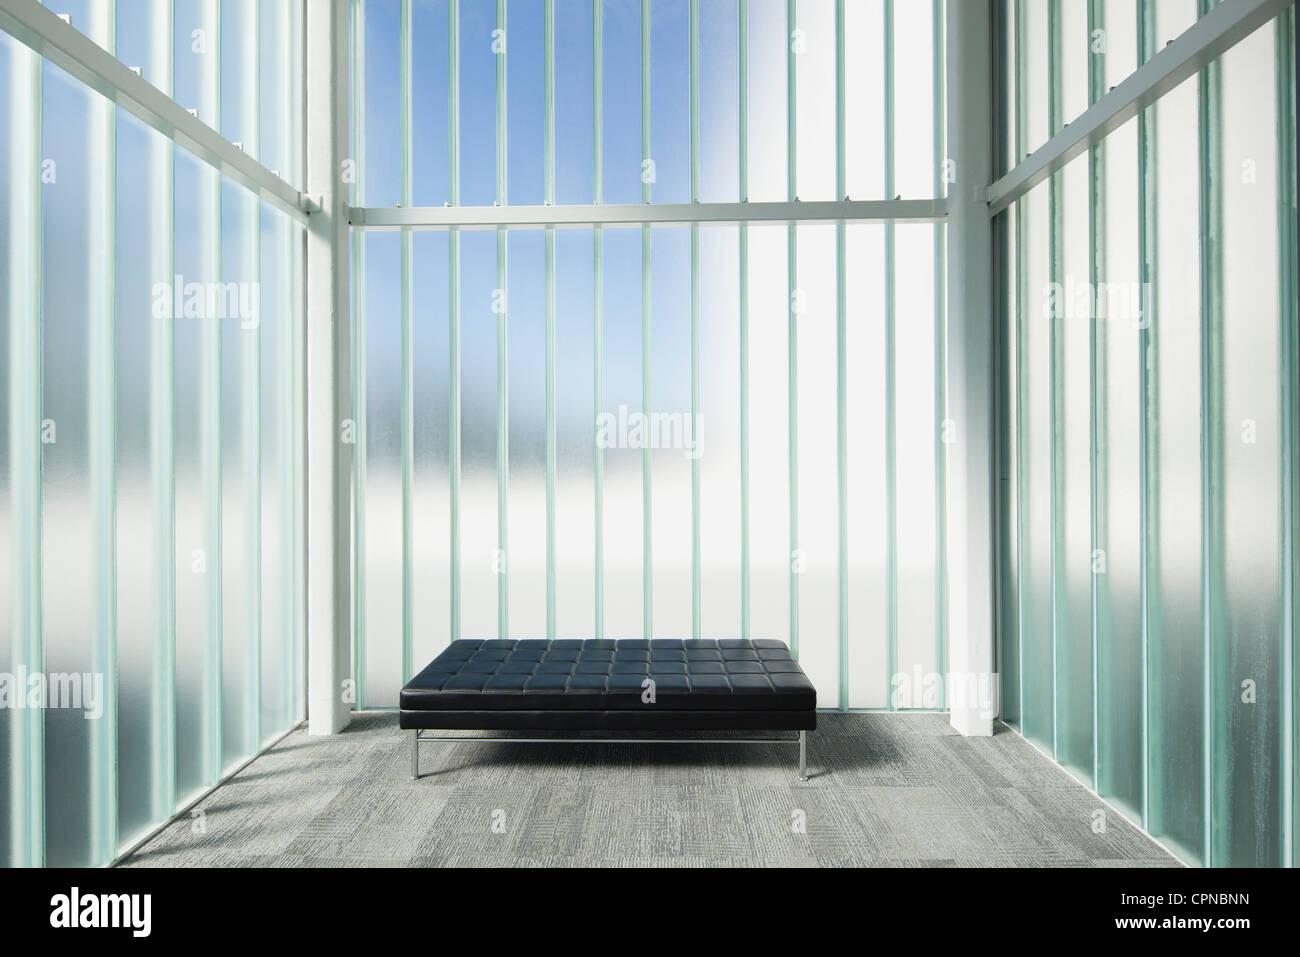 Empty bench in modern lobby - Stock Image